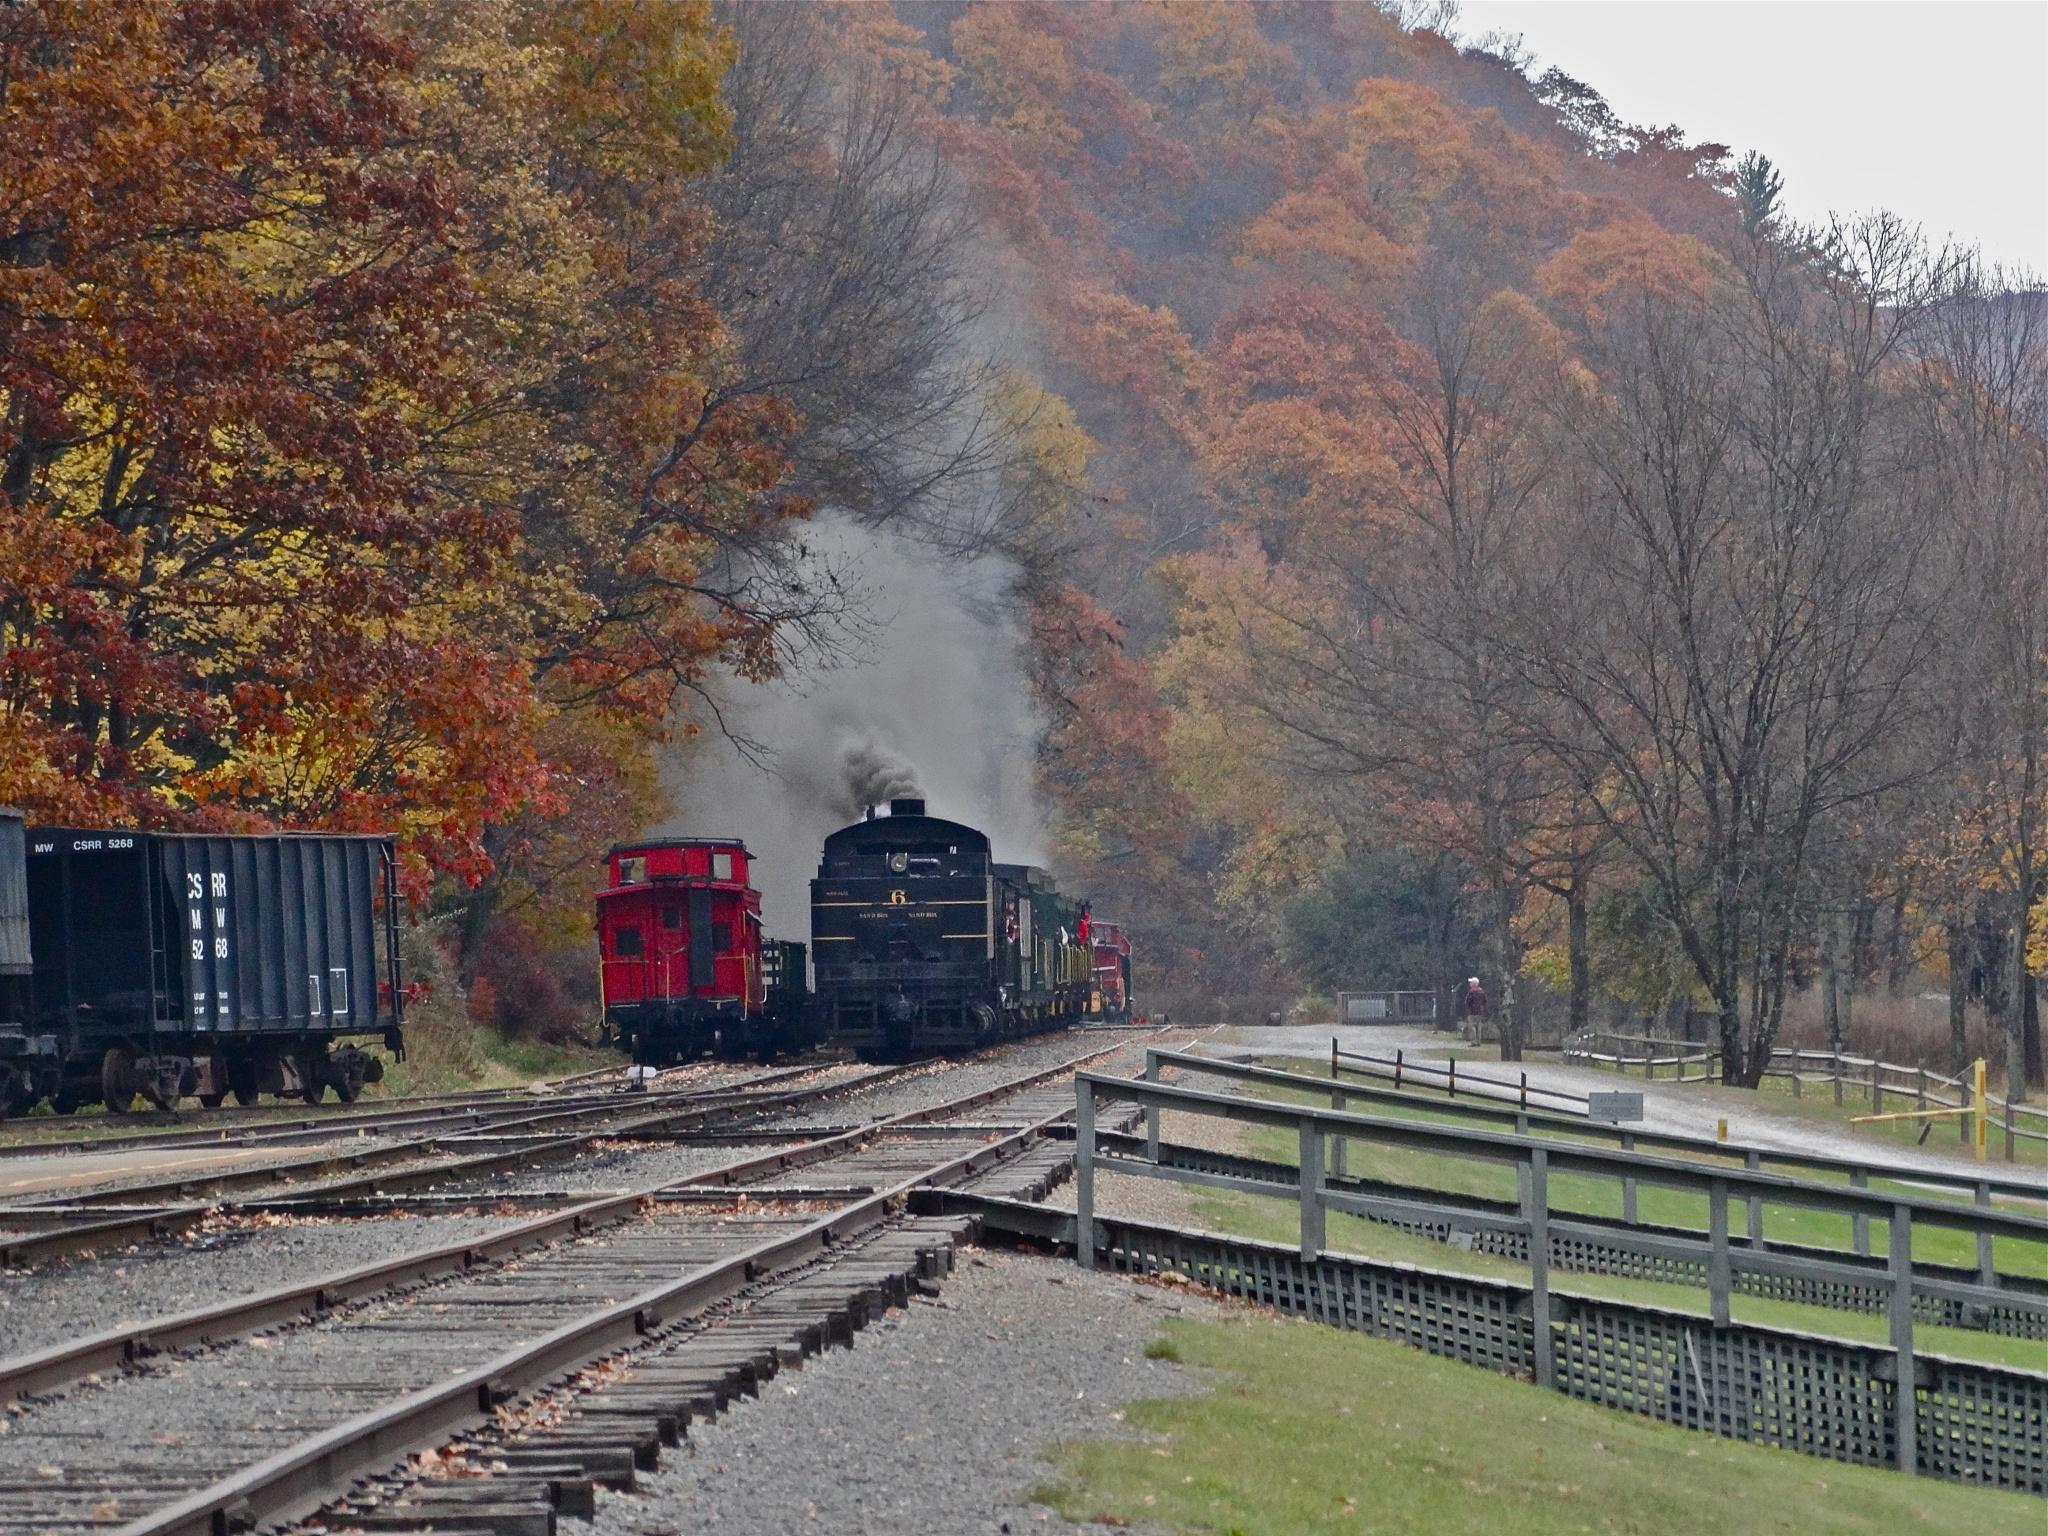 Cass Railroad West Virginia by gloria.west.12